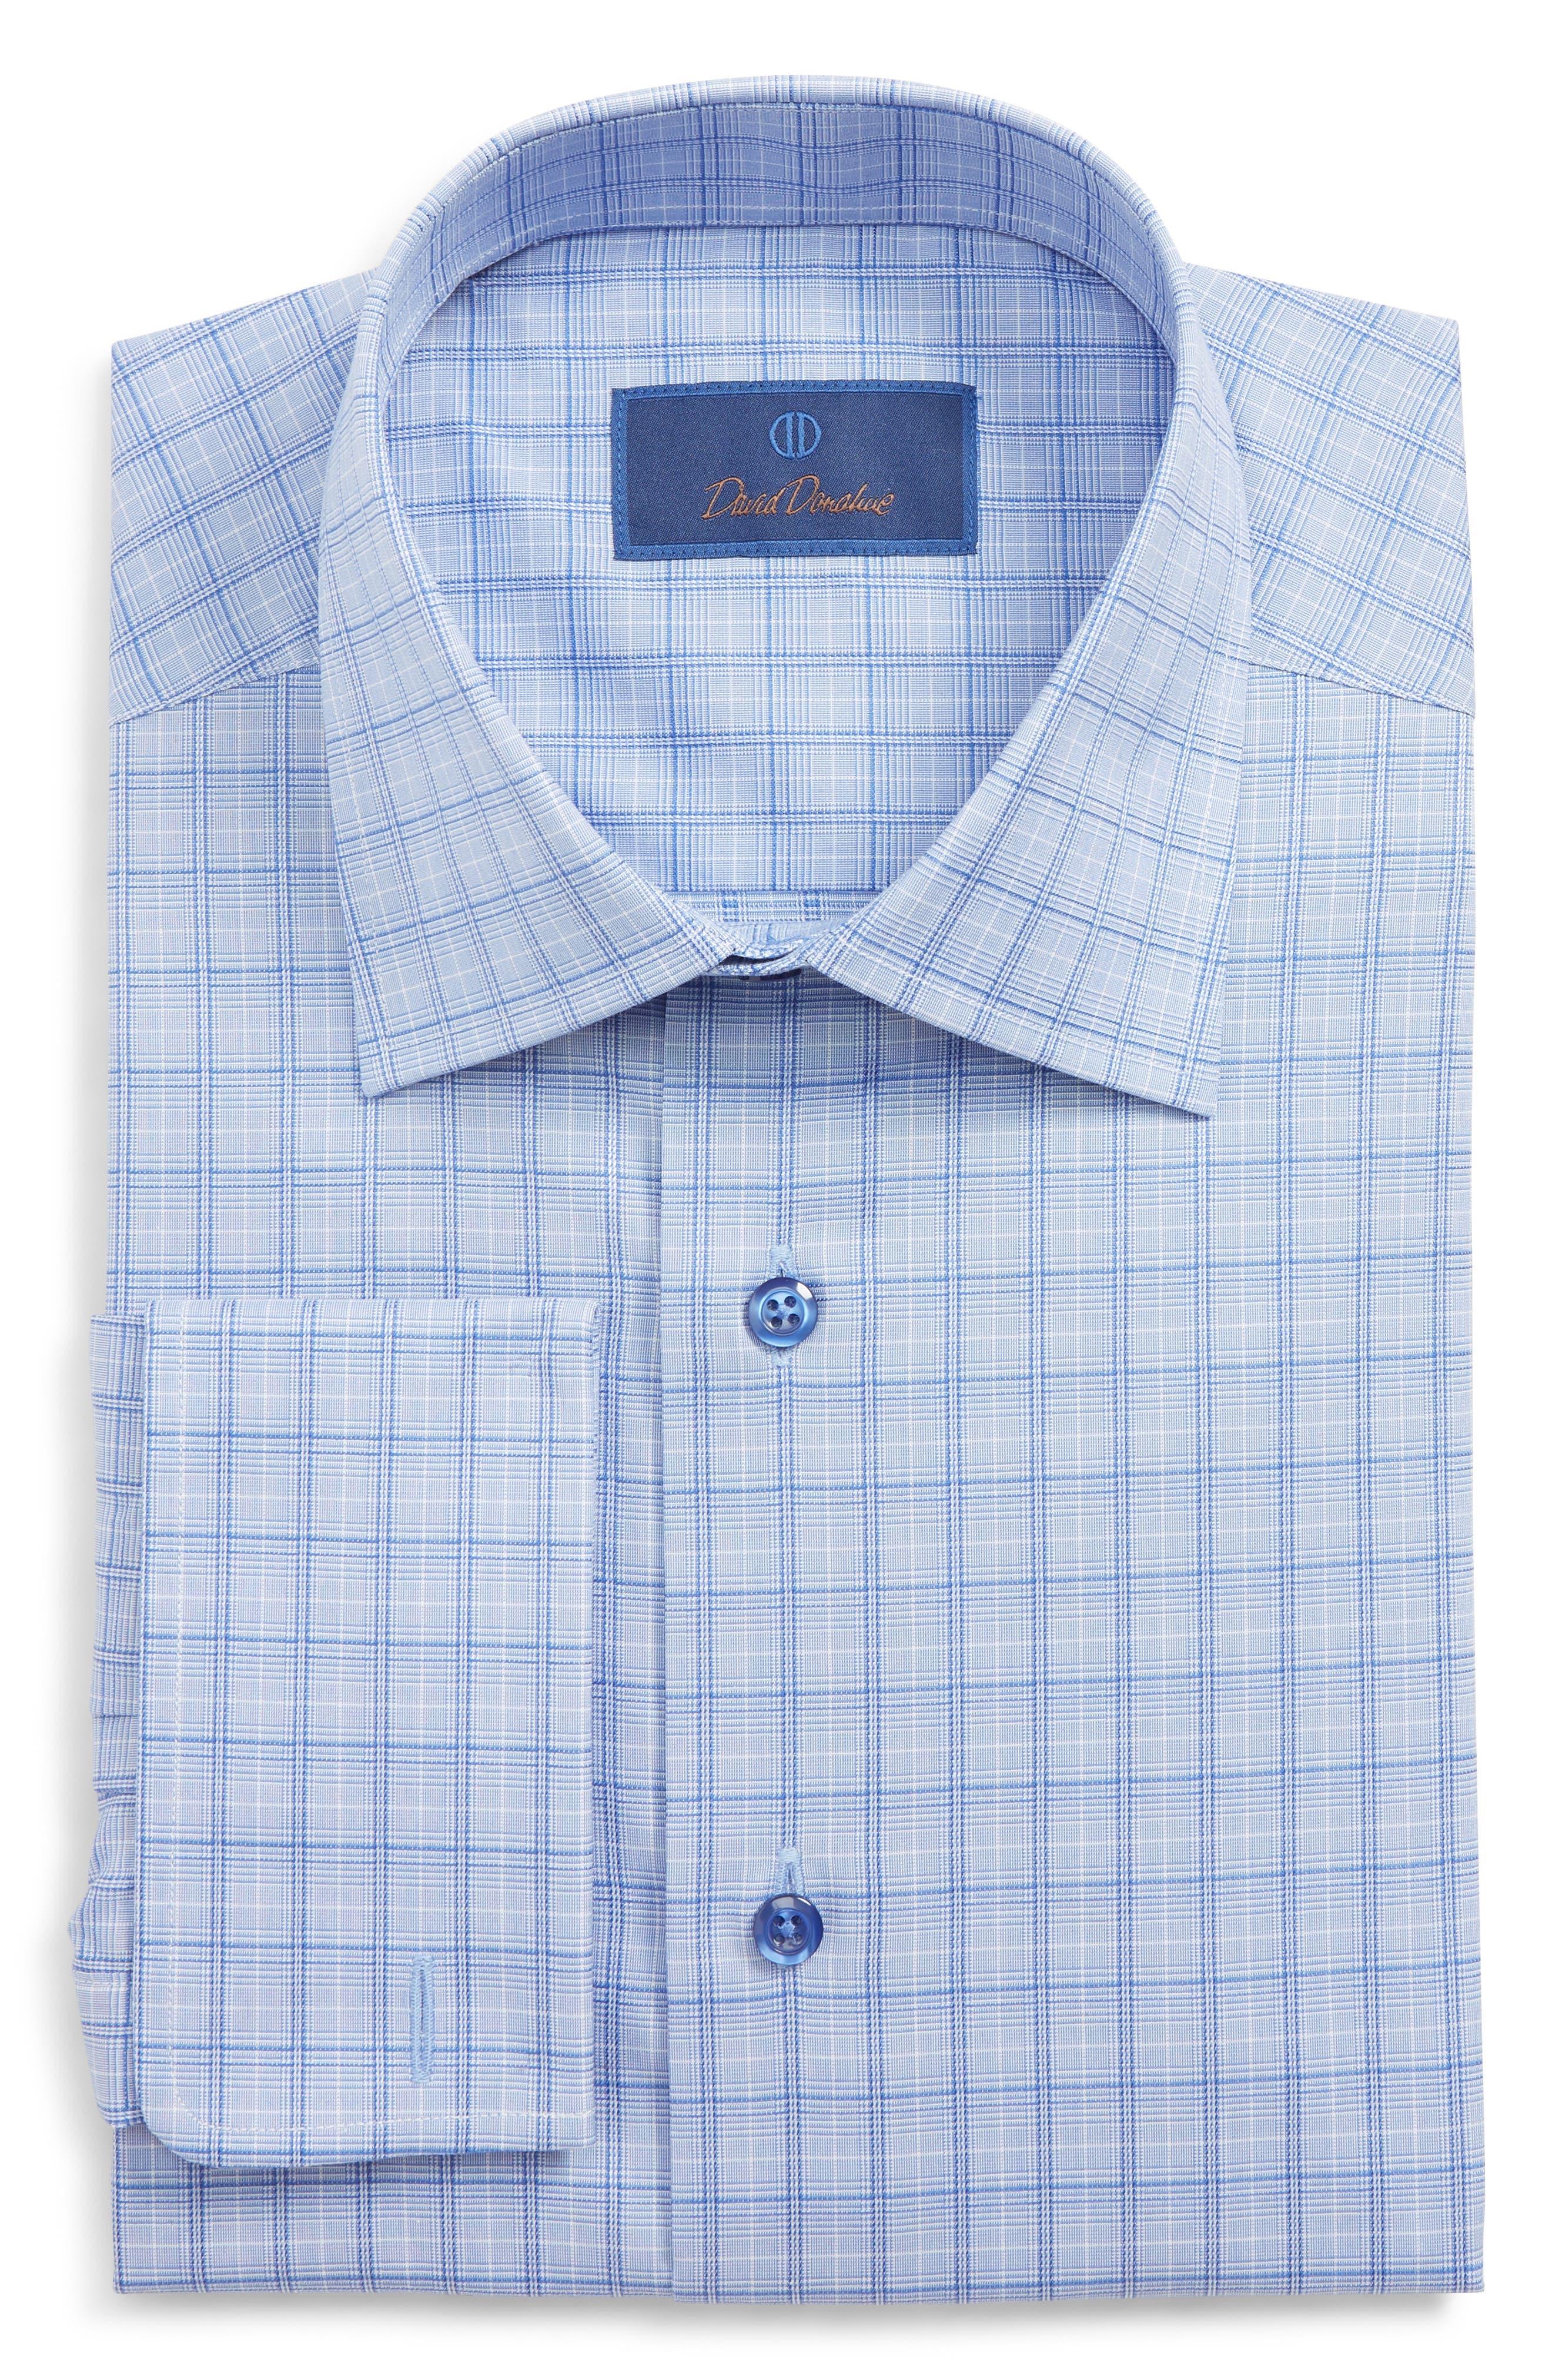 DAVID DONAHUE, Regular Fit Plaid Dress Shirt, Main thumbnail 1, color, BLUE/ NAVY